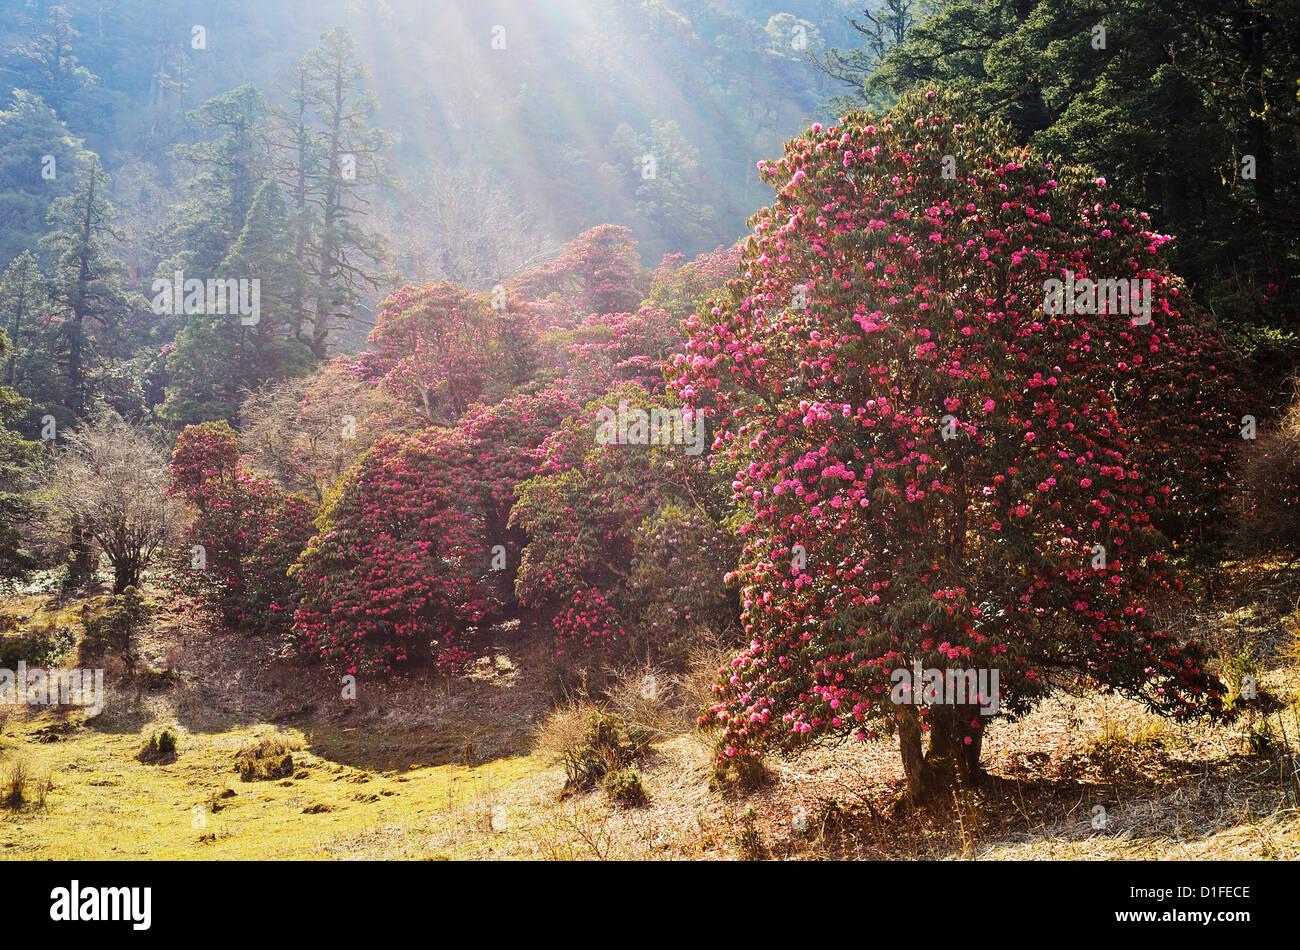 Rhododendron forest, near Titi, Annapurna Conservation Area, Dhawalagiri (Dhaulagiri), Western Region (Pashchimanchal), Stock Photo